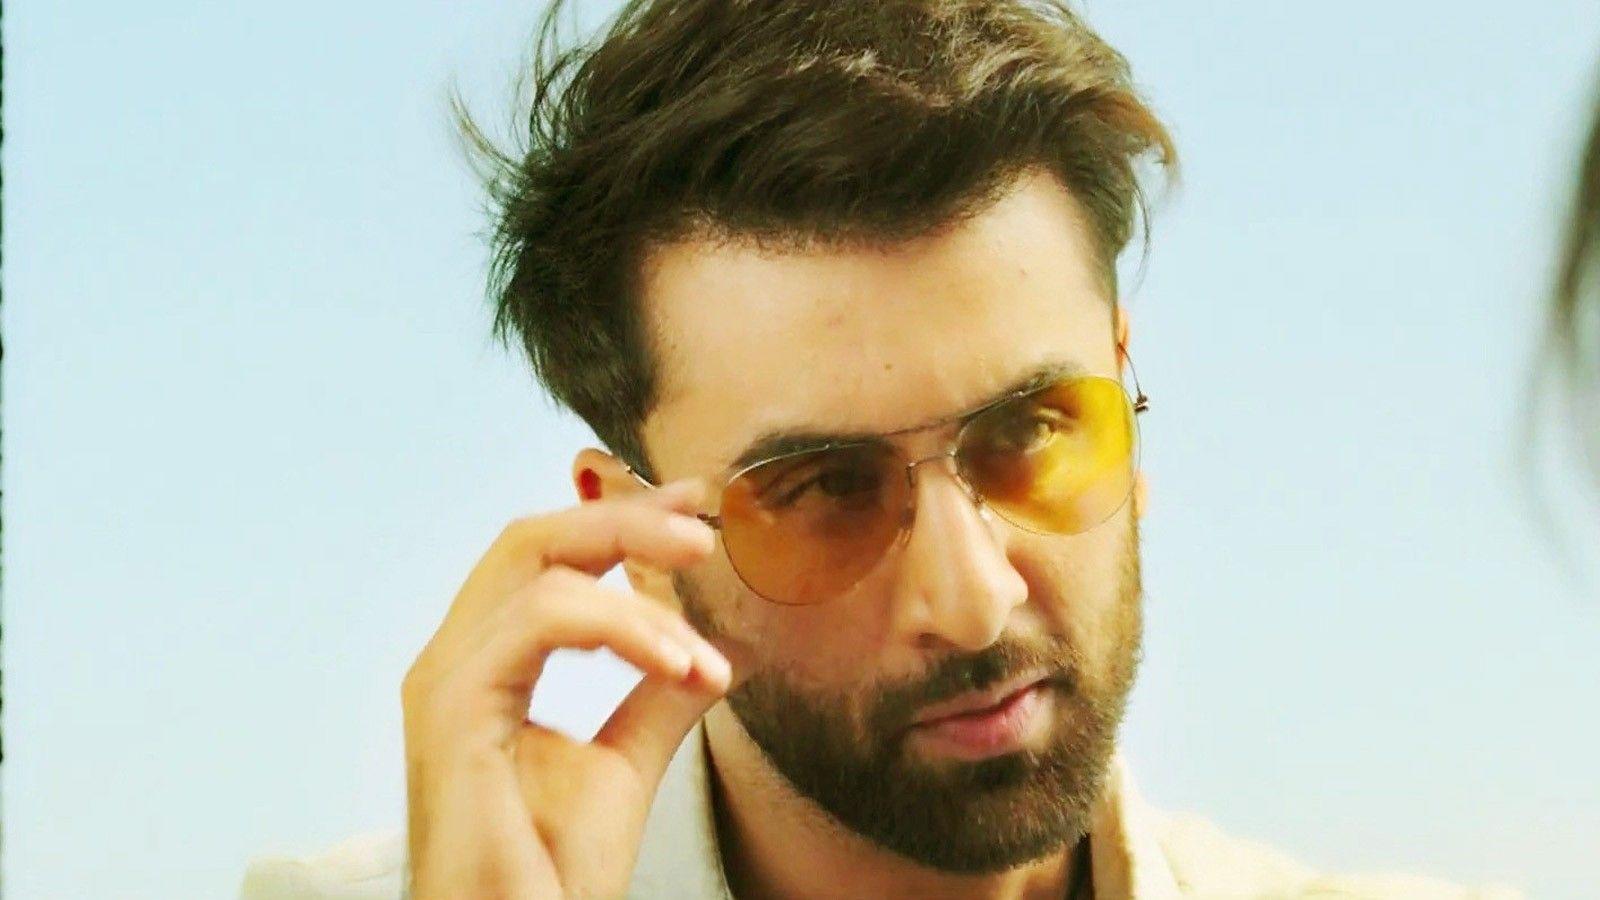 Ranbir Kapoor in Tamasha Movie #RanbirKapoor #Tamasha # ...